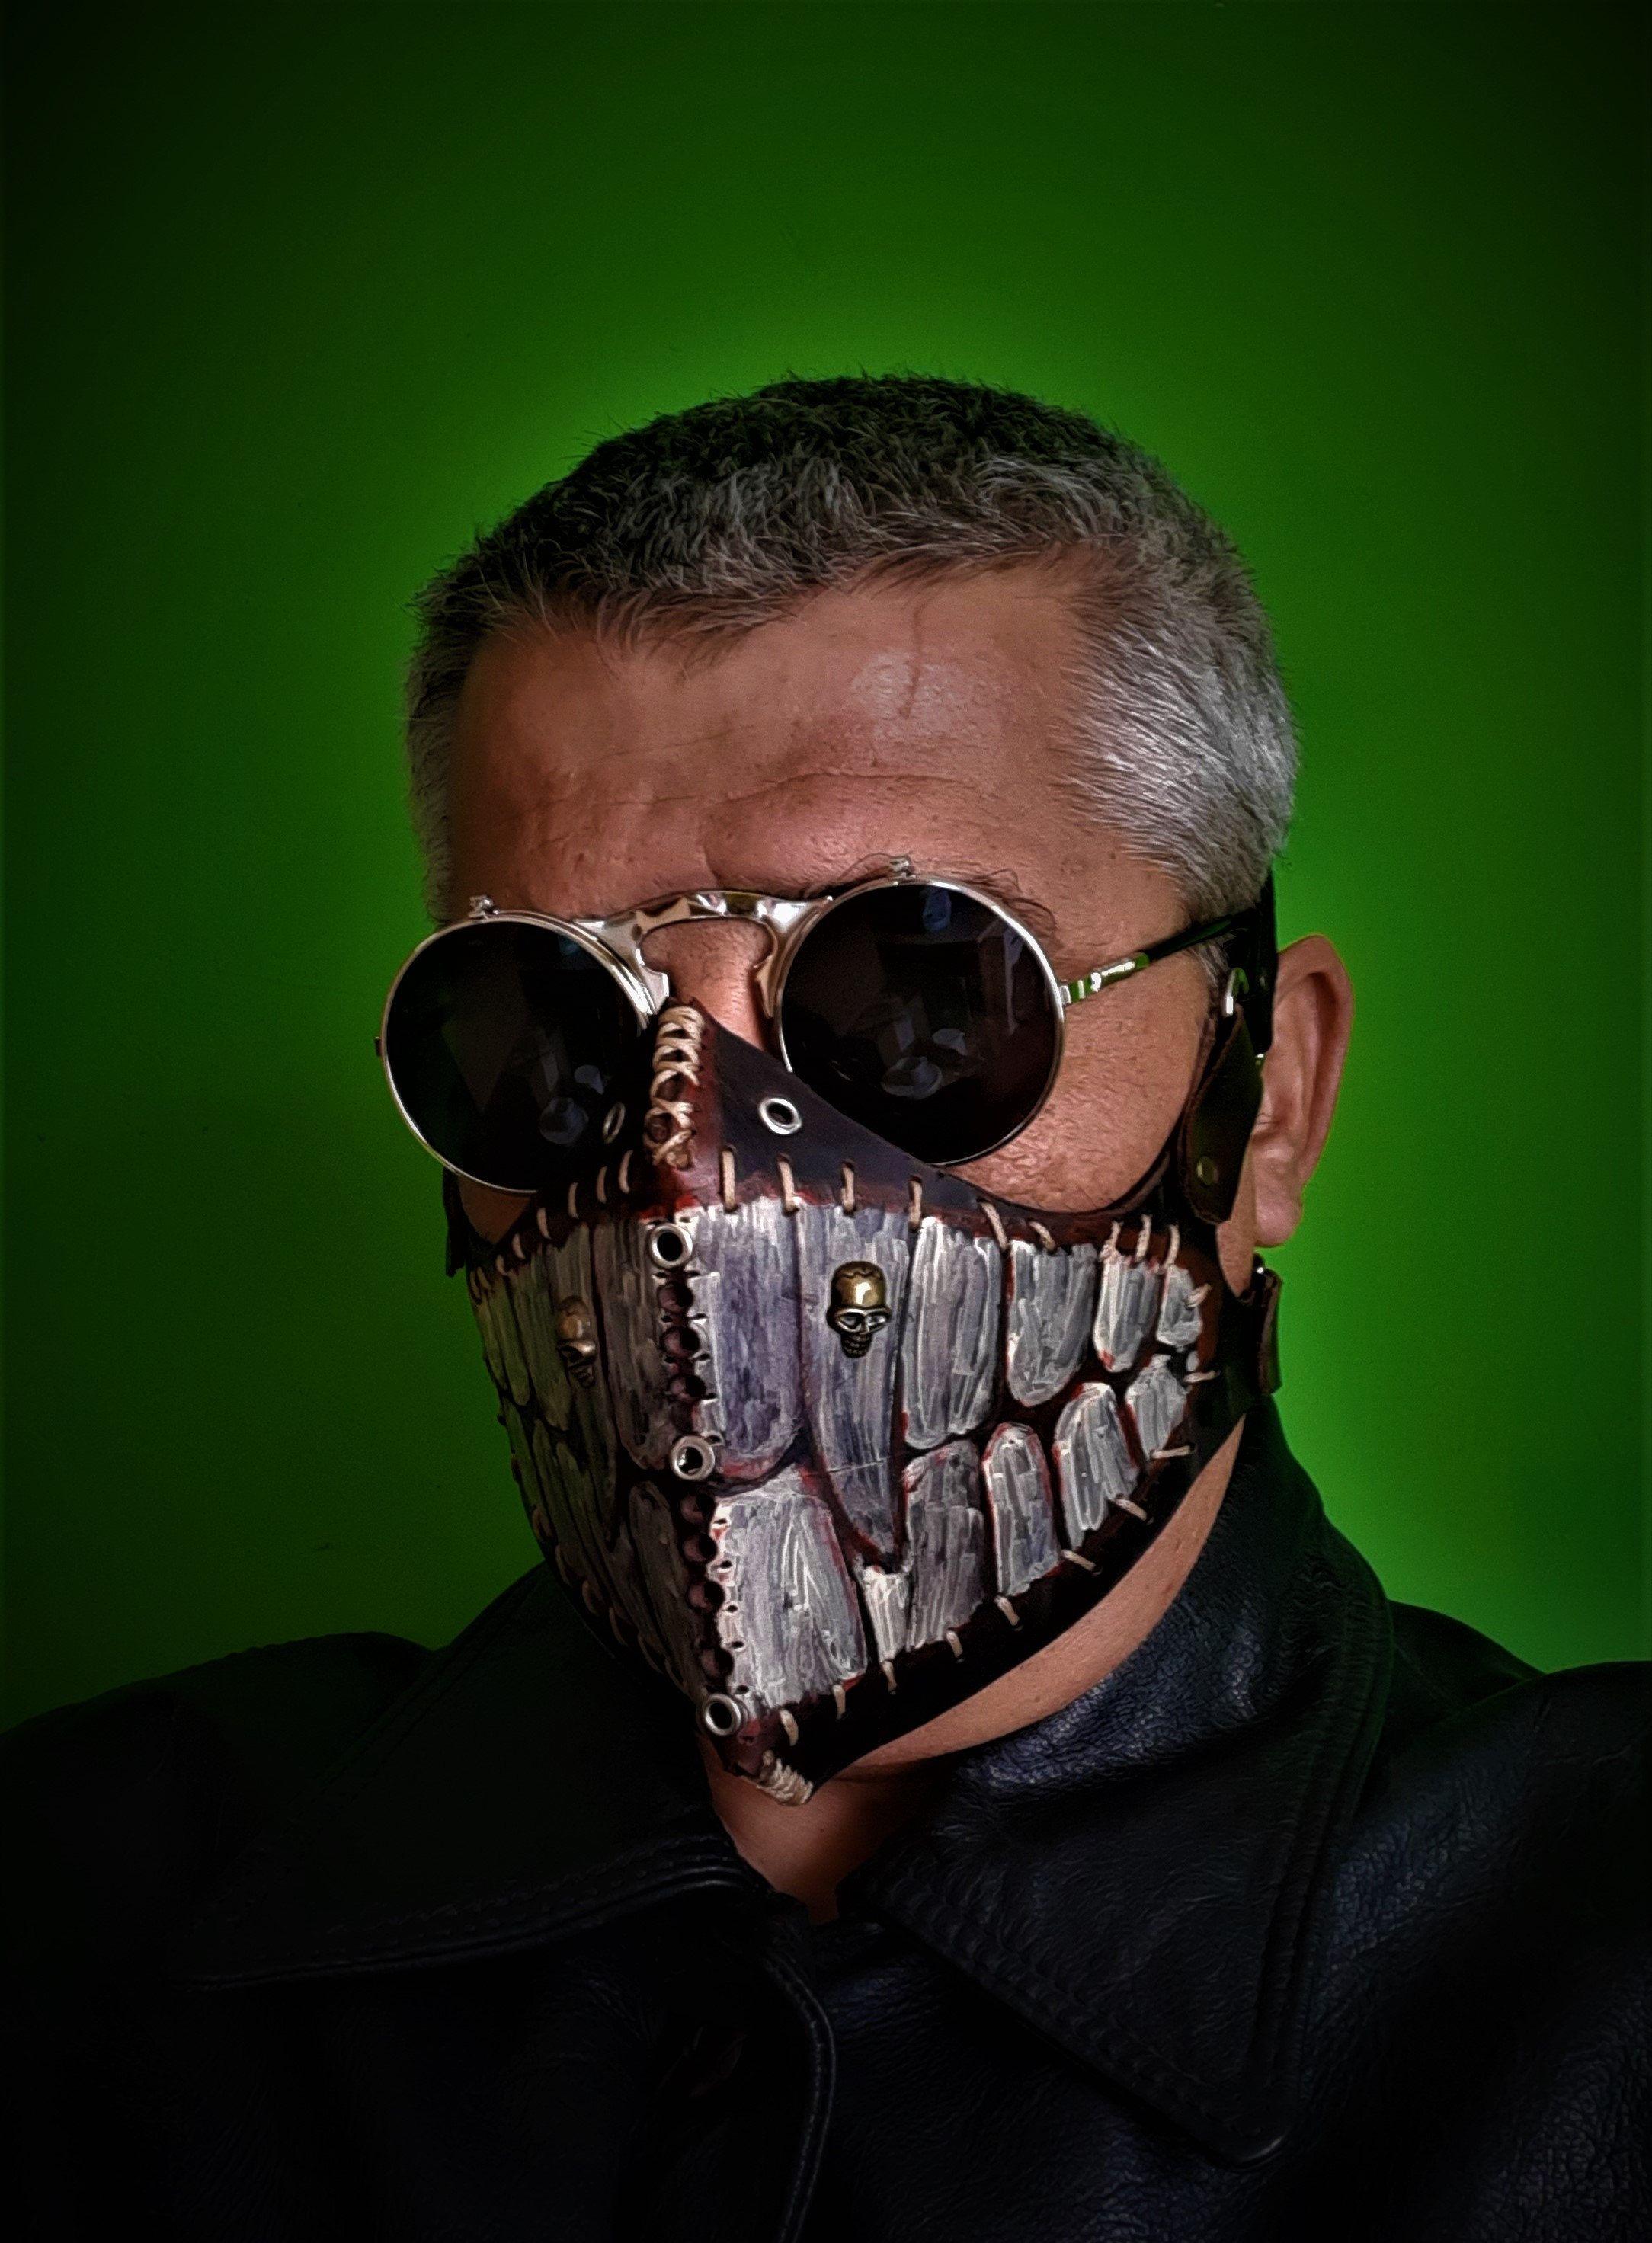 Dieselpunk Half Face Leather Mask Reusable Dust Mask Biker Mouth Mask 4 Rider Face Black Motorcycle Men Leather Face Mask Fashion Face Mask Steampunk Leather